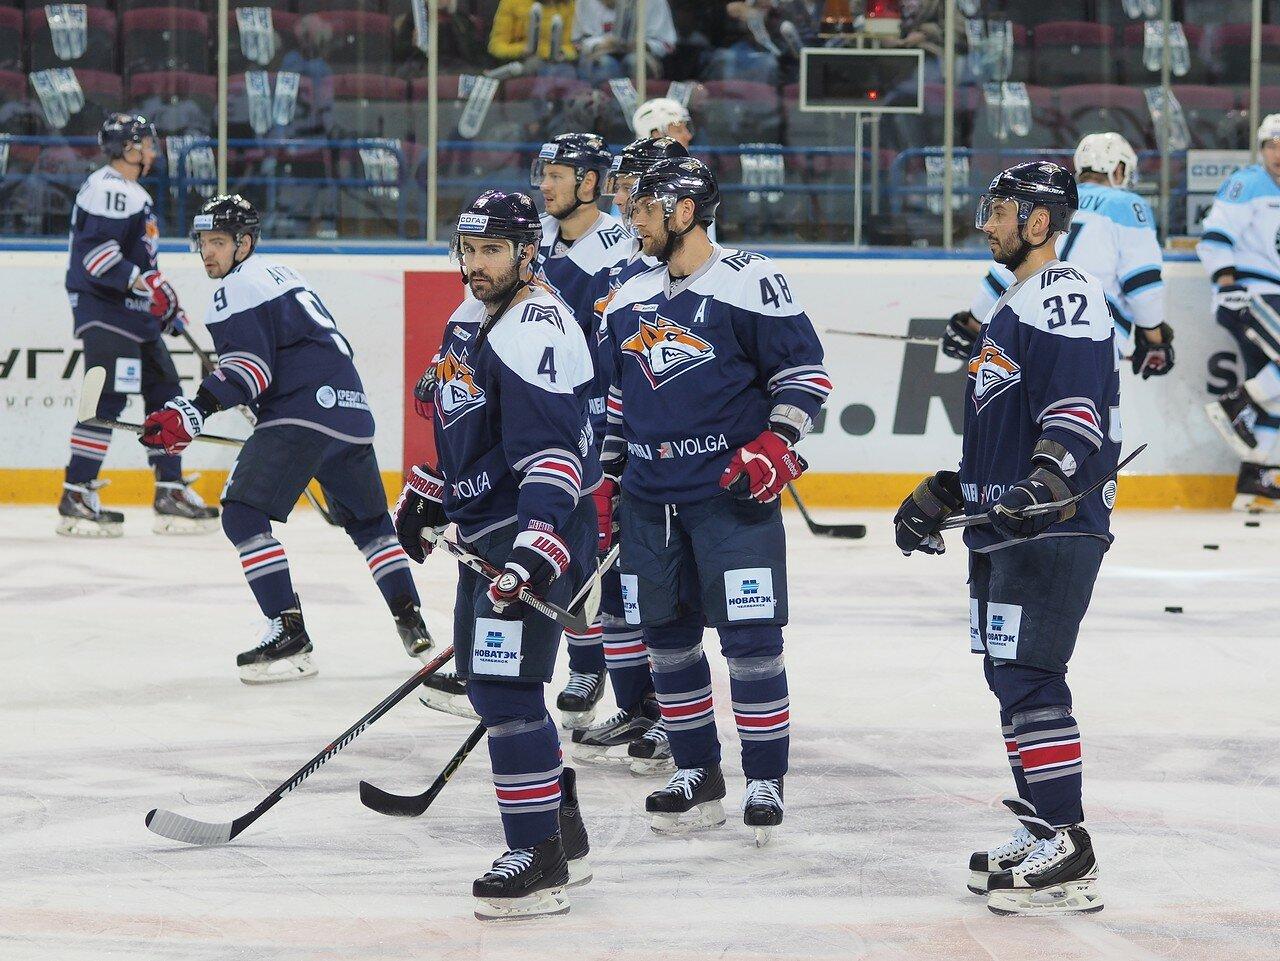 24Плей-офф 2016 Восток 1/2 Металлург - Сибирь 10.03.2016